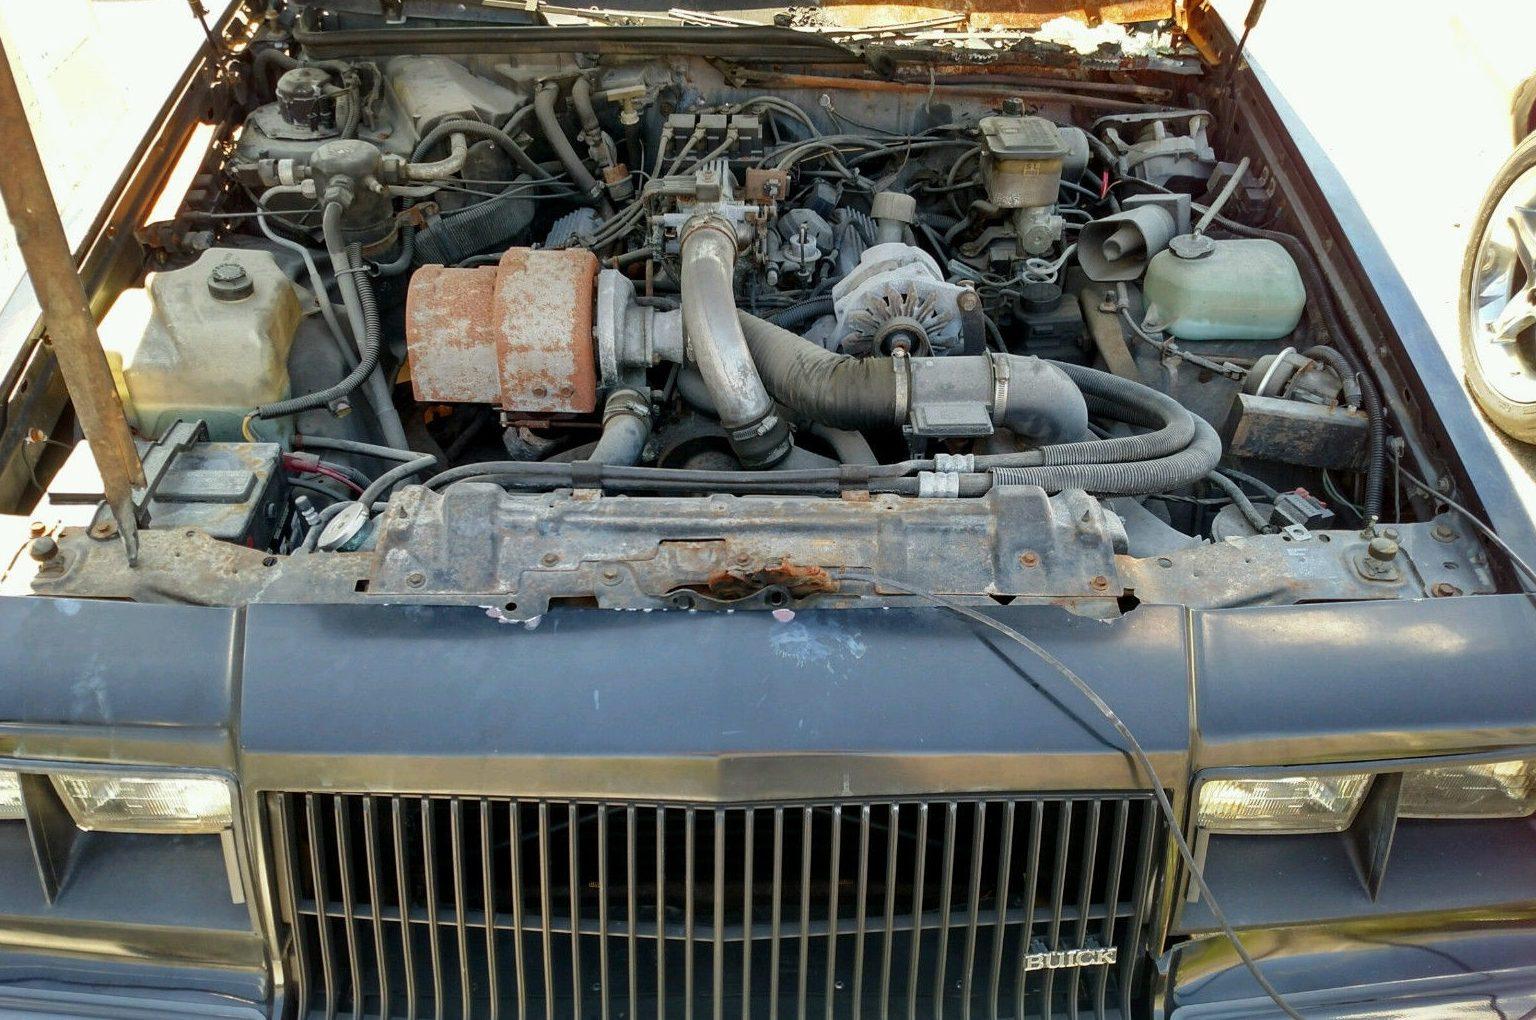 Burn Victim: 1987 Buick Grand National